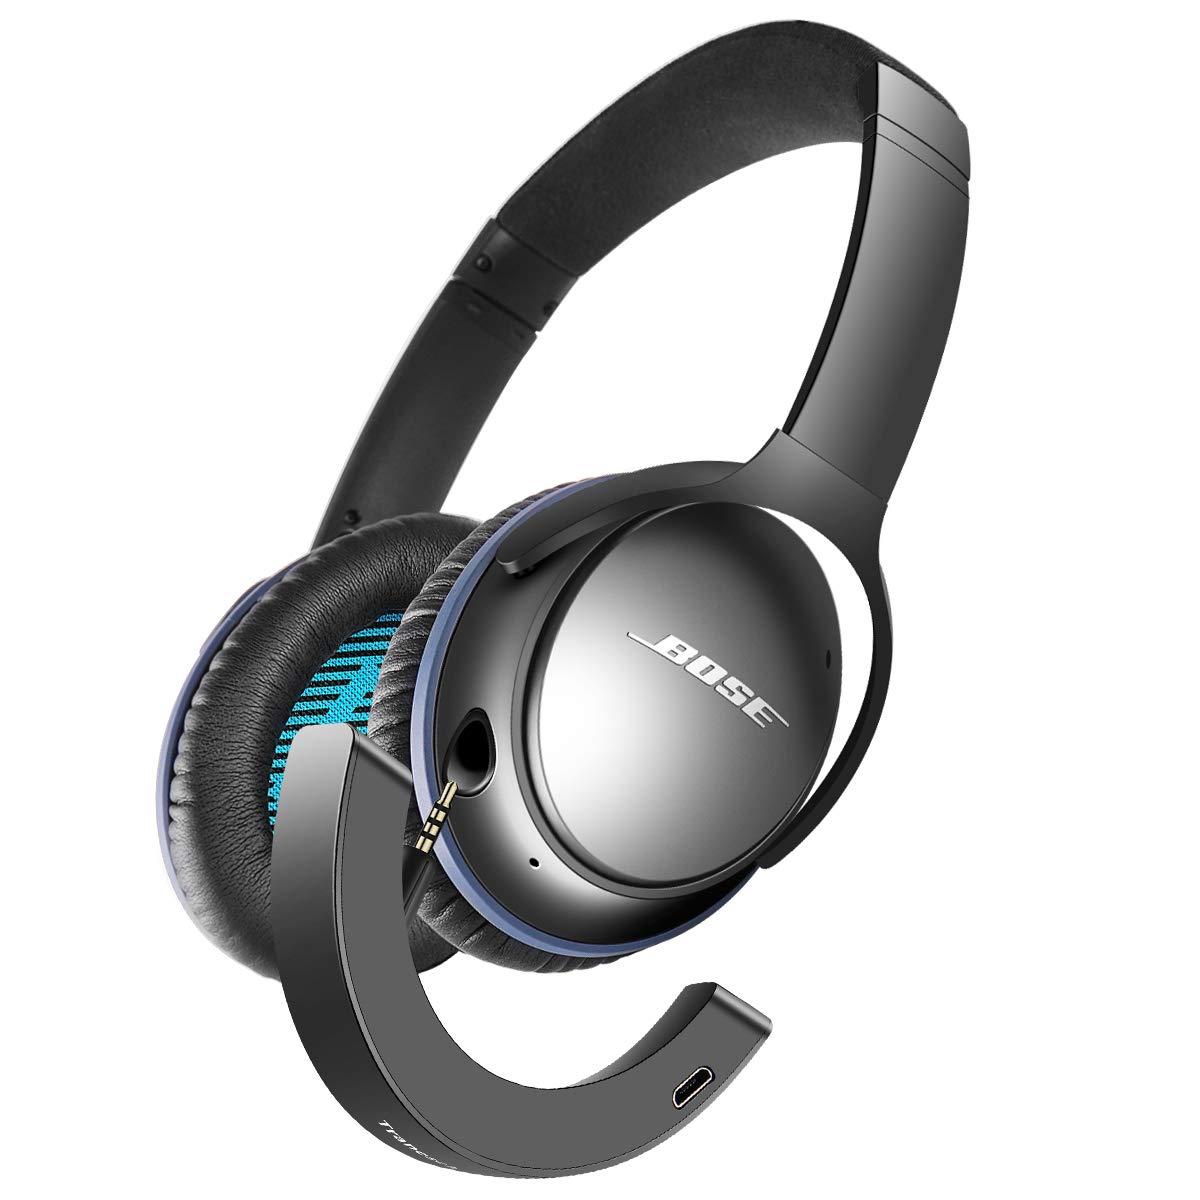 Tranesca Compatible Bluetooth Adapter Receiver for Bose quietcomfort 25 Headphone (Black) by Tranesca